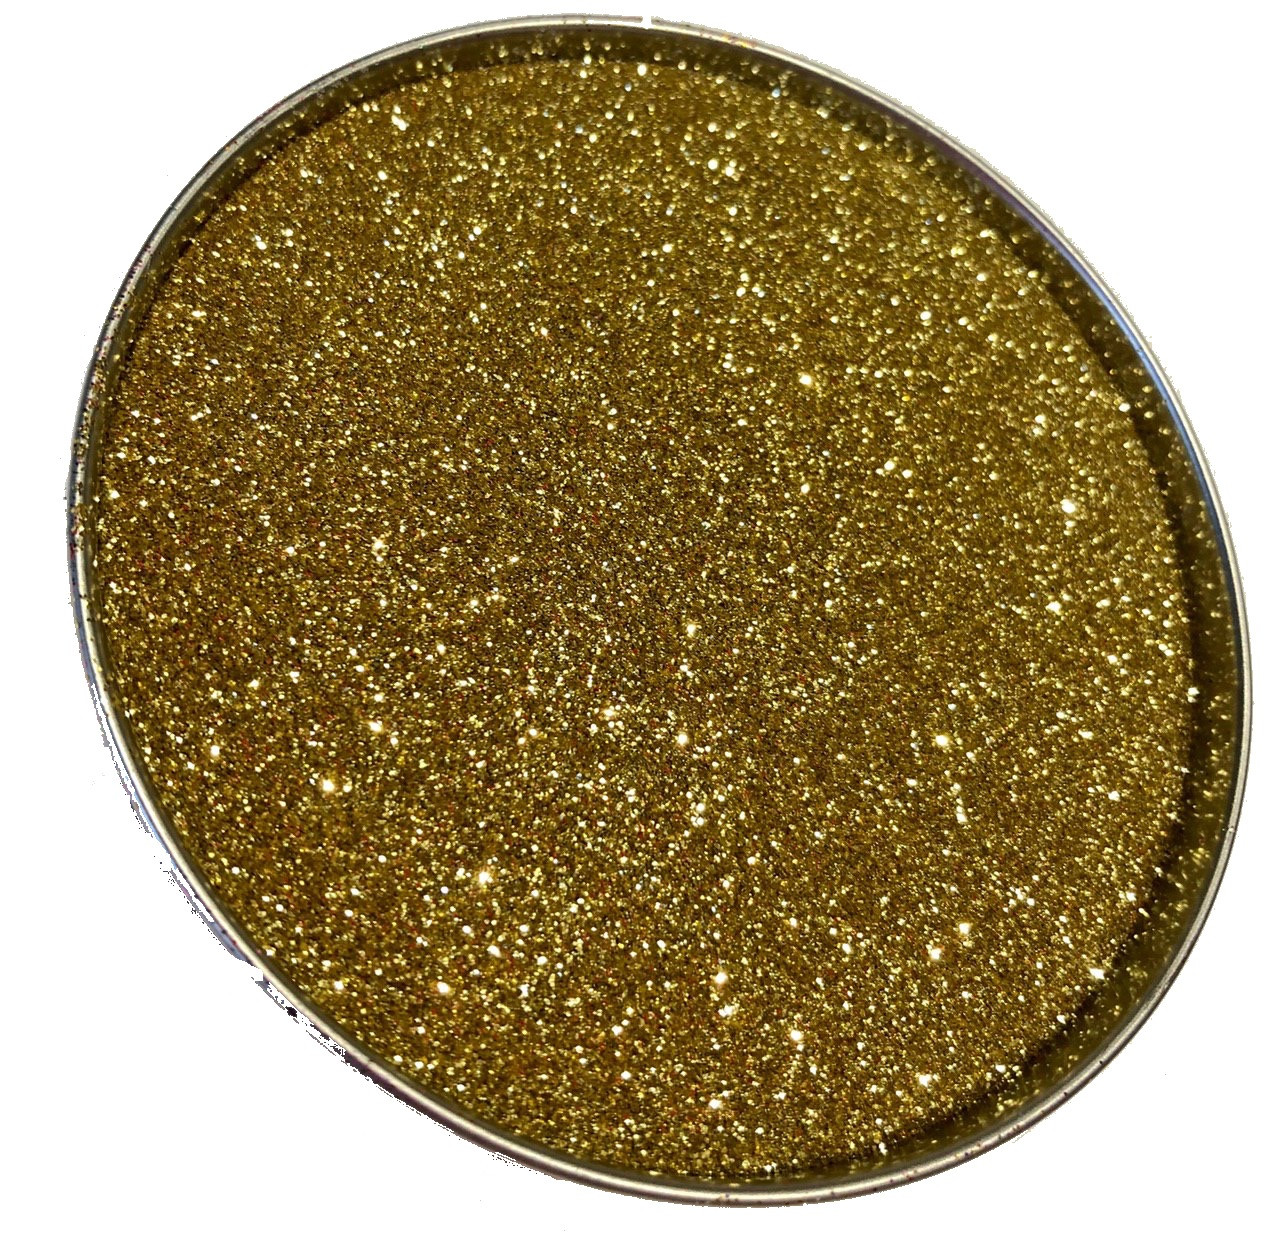 Глиттер золото TS108-128, 150мл